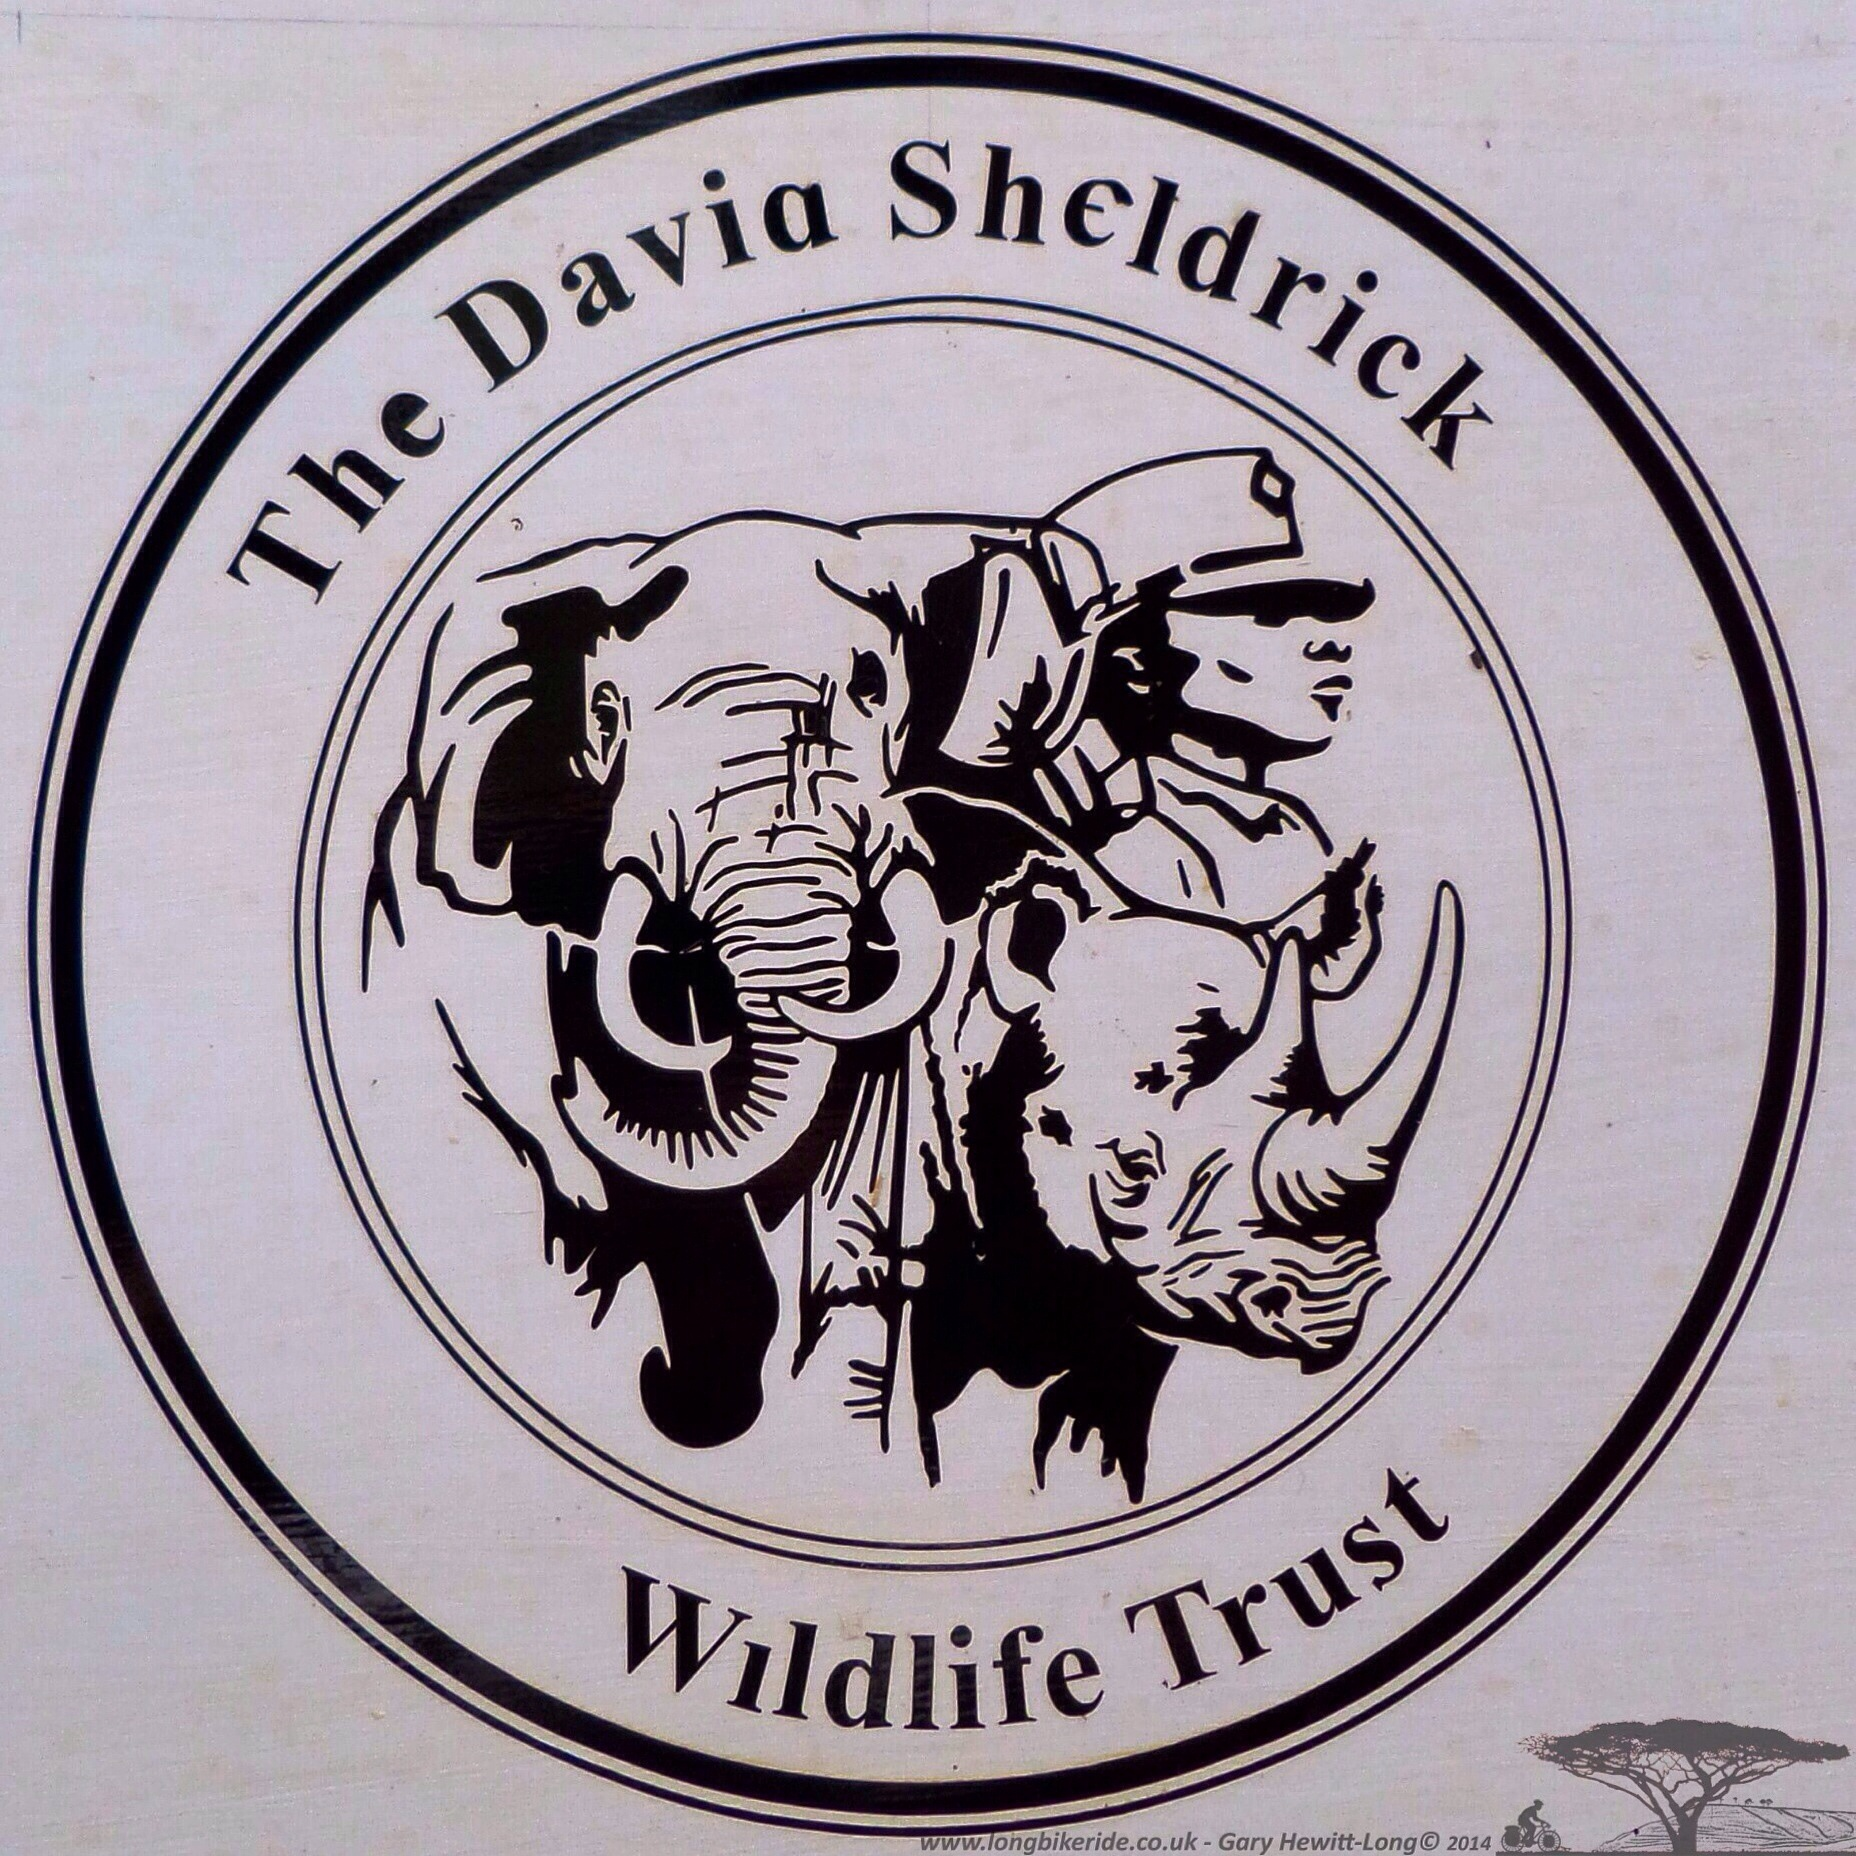 The David Sheldrick Trust, Kenya